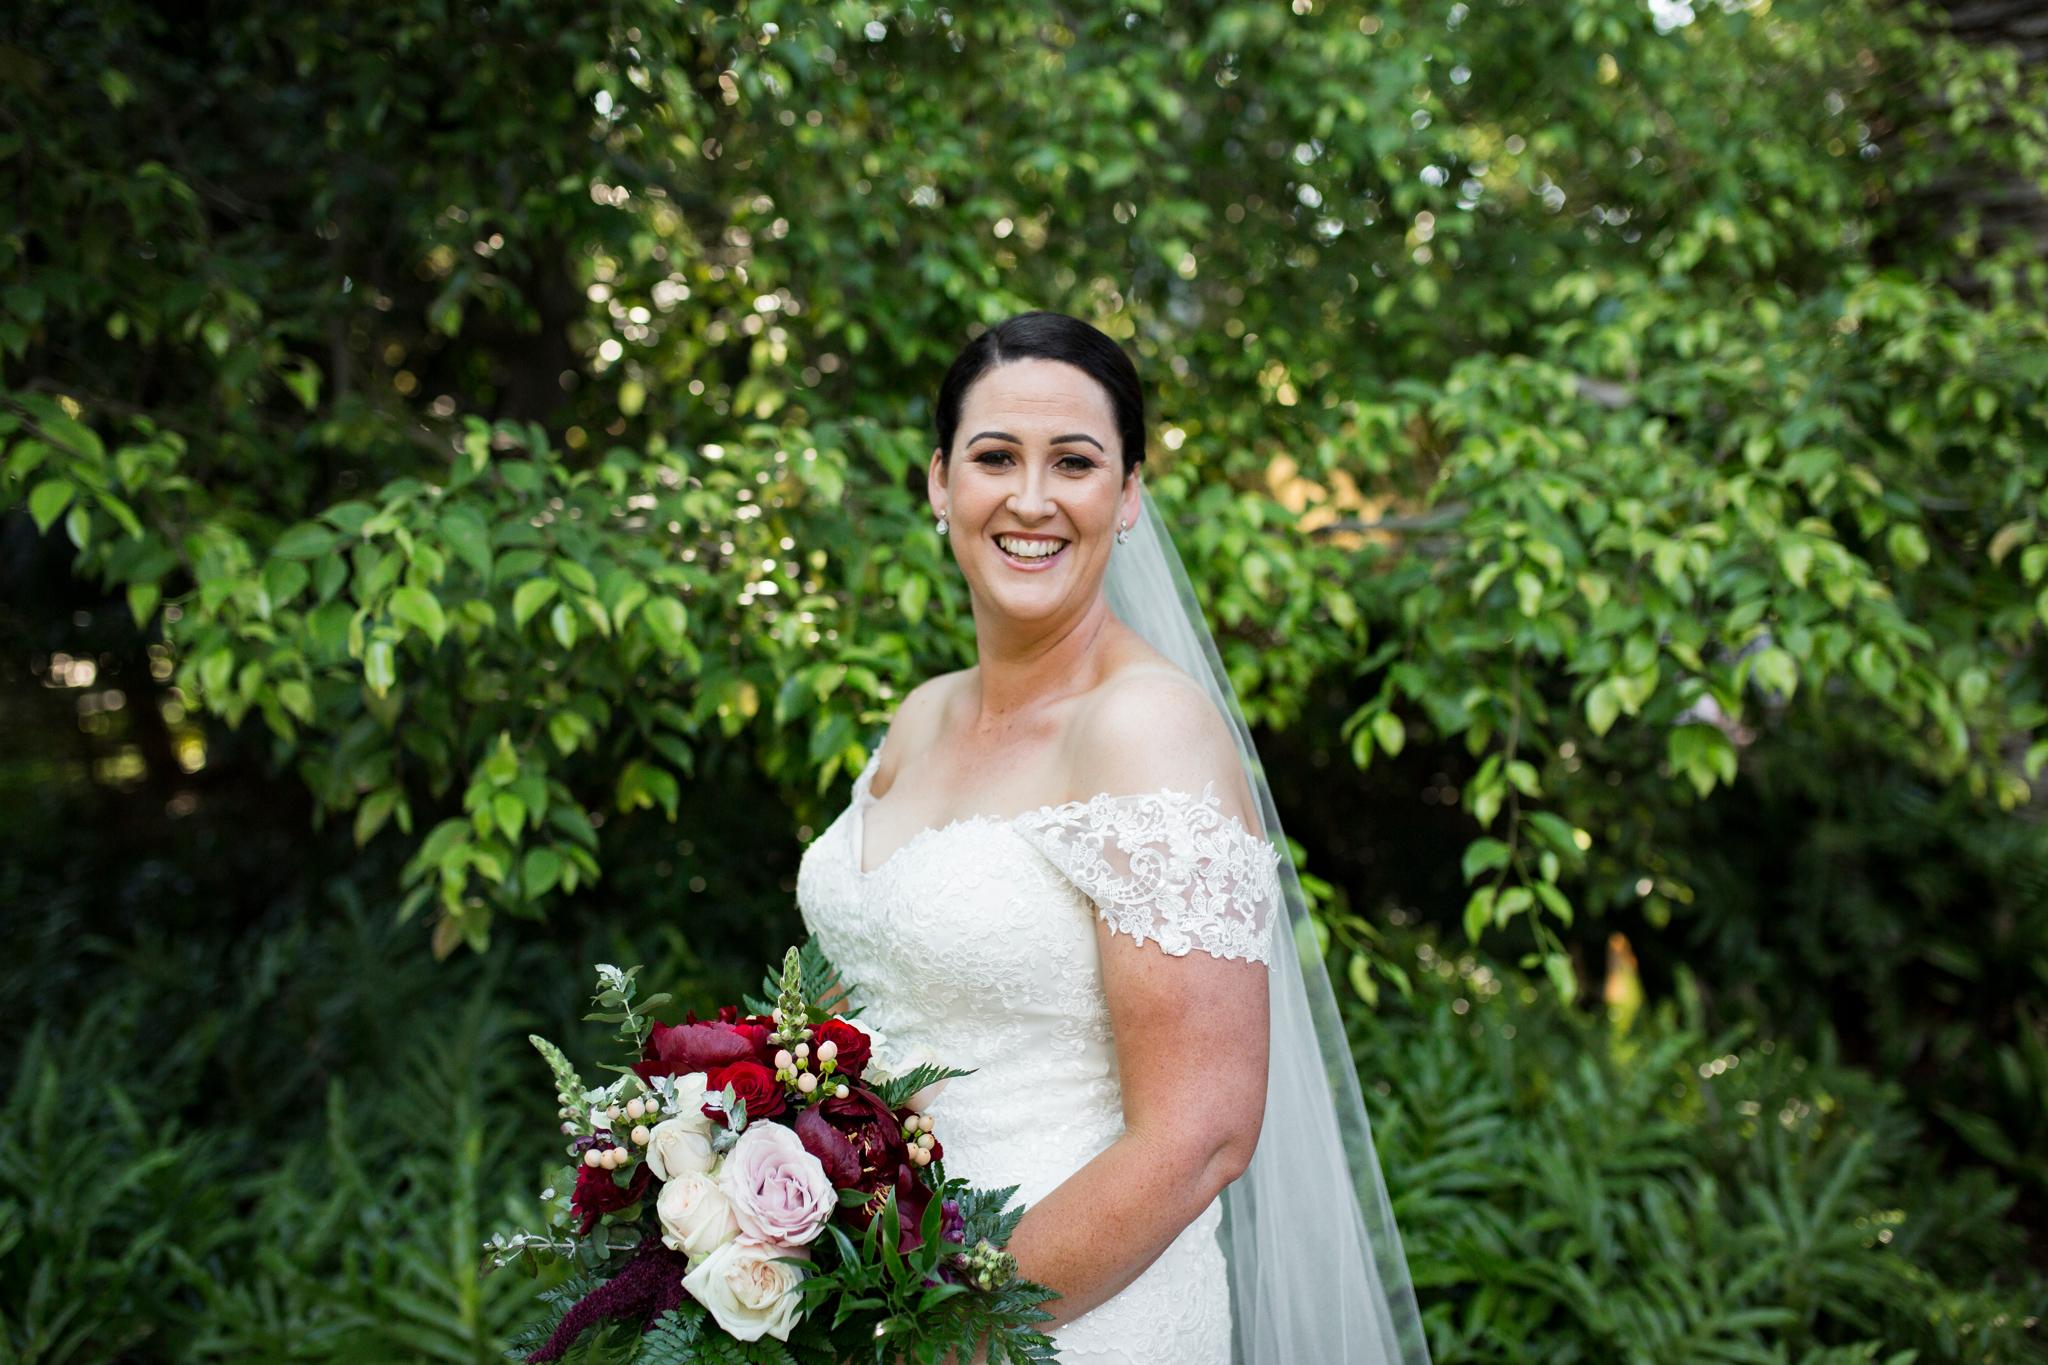 Kyme-steve-wedding-169.jpg